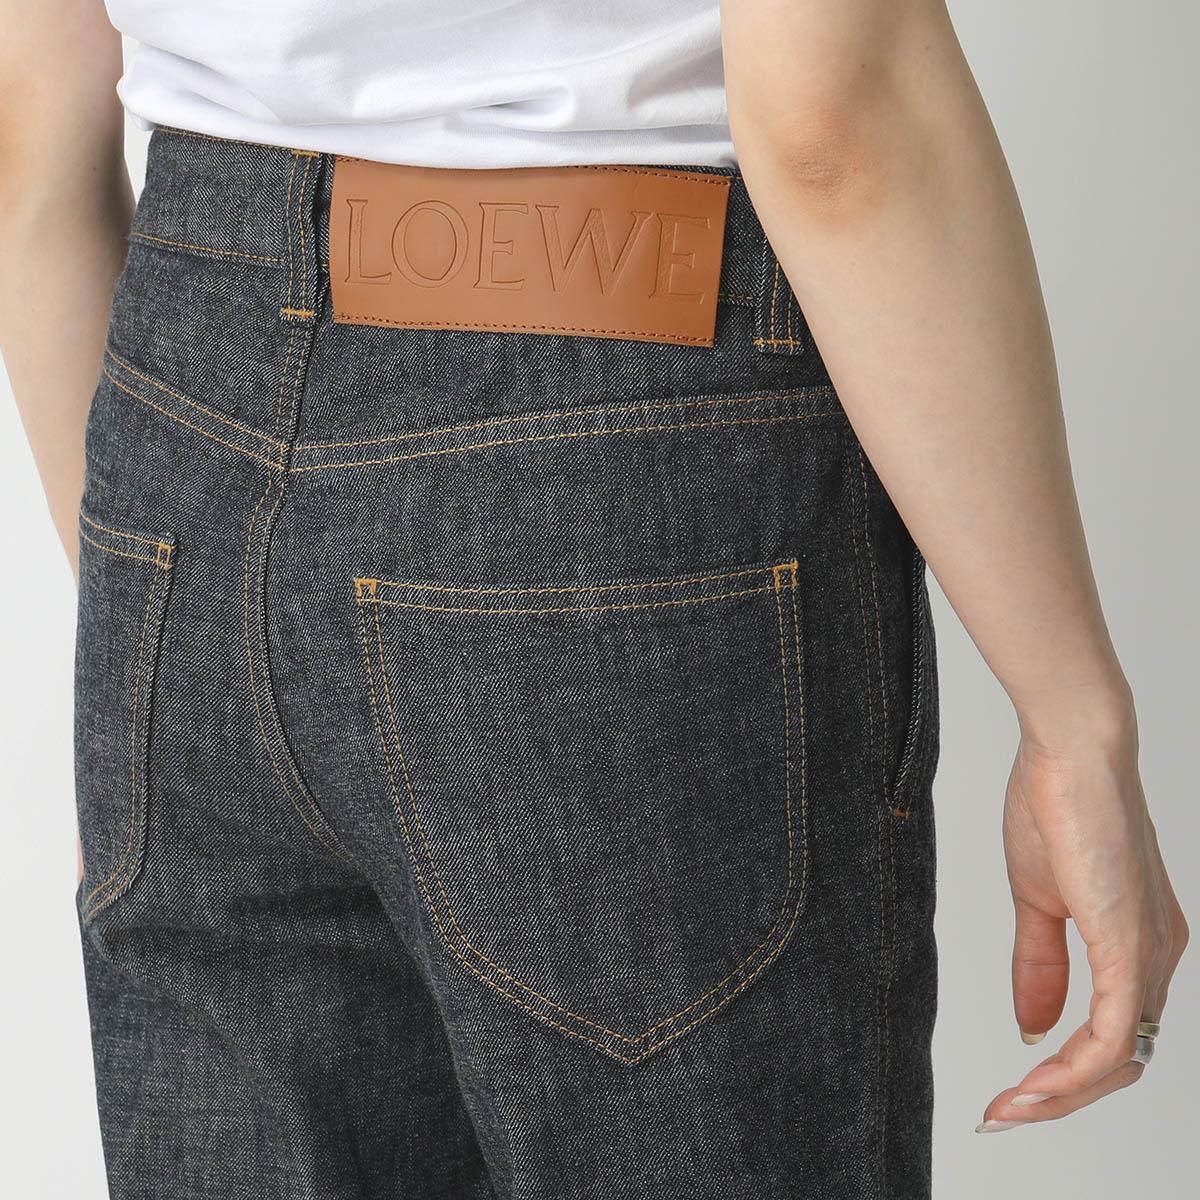 LOEWE ロエベ S2102190IB Denim Trousers デニム アンクル丈 ハイライズ 5820/INDIGO レディース